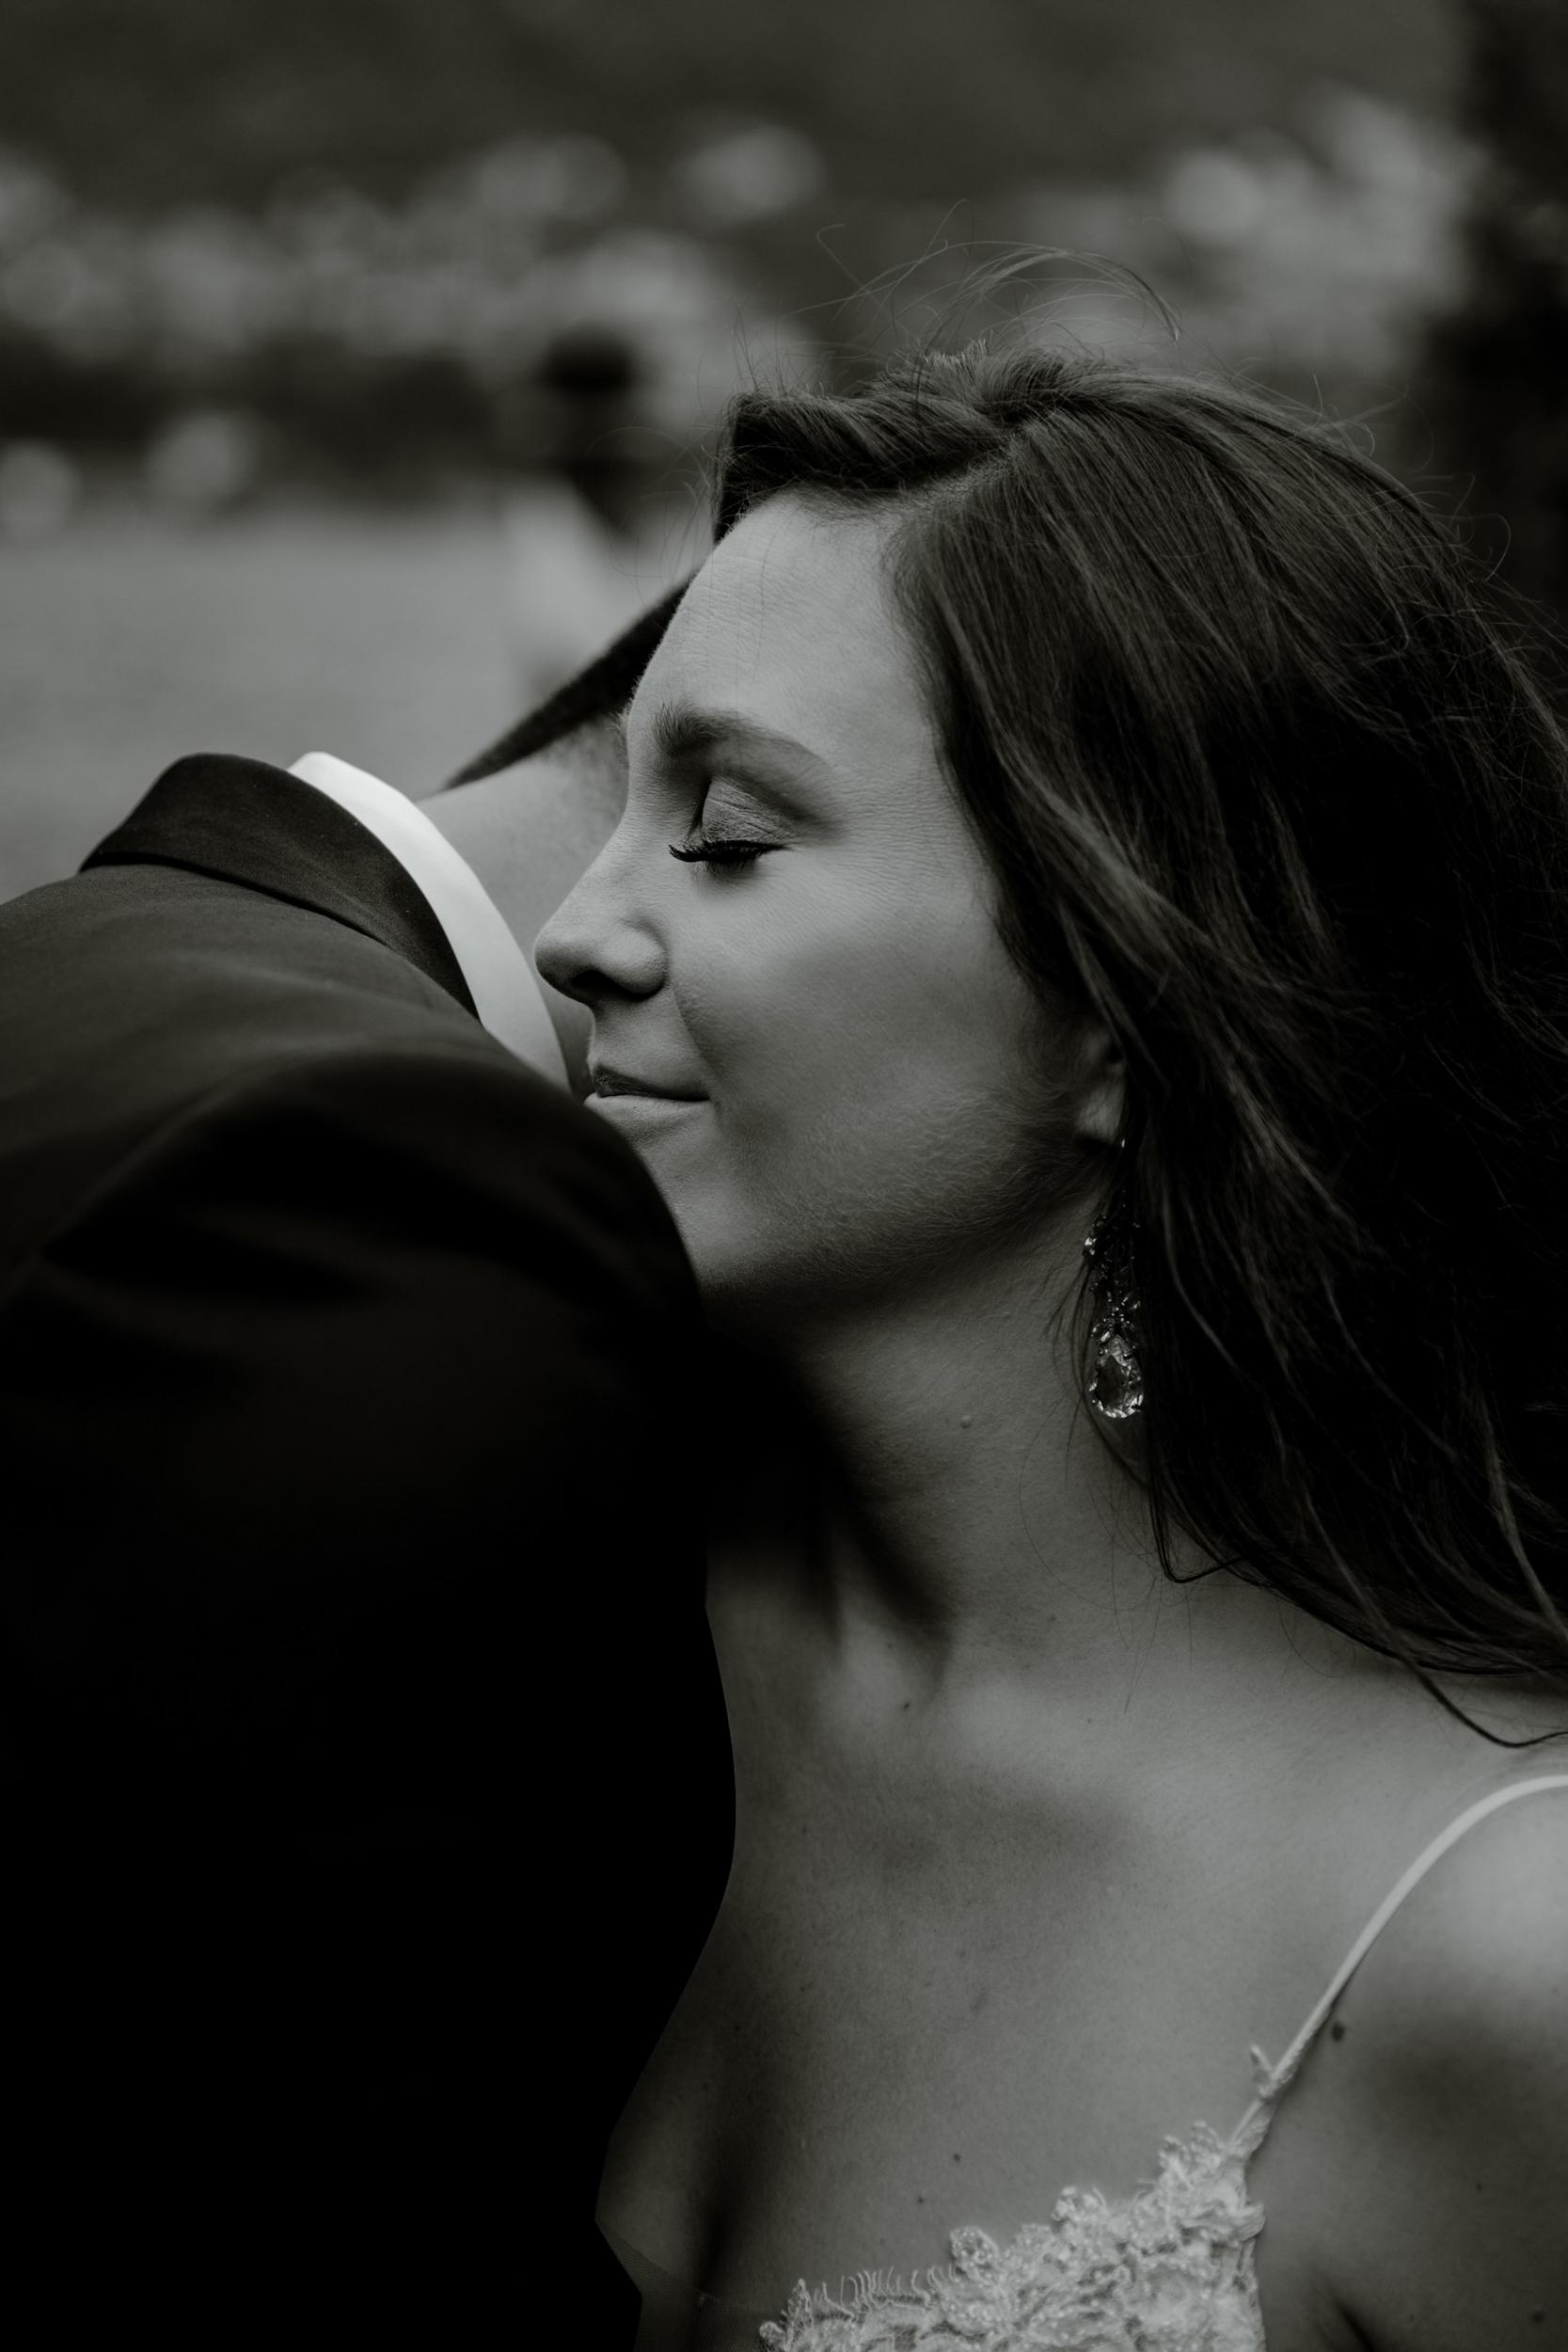 02_best-wedding-photographer-europe.jpg